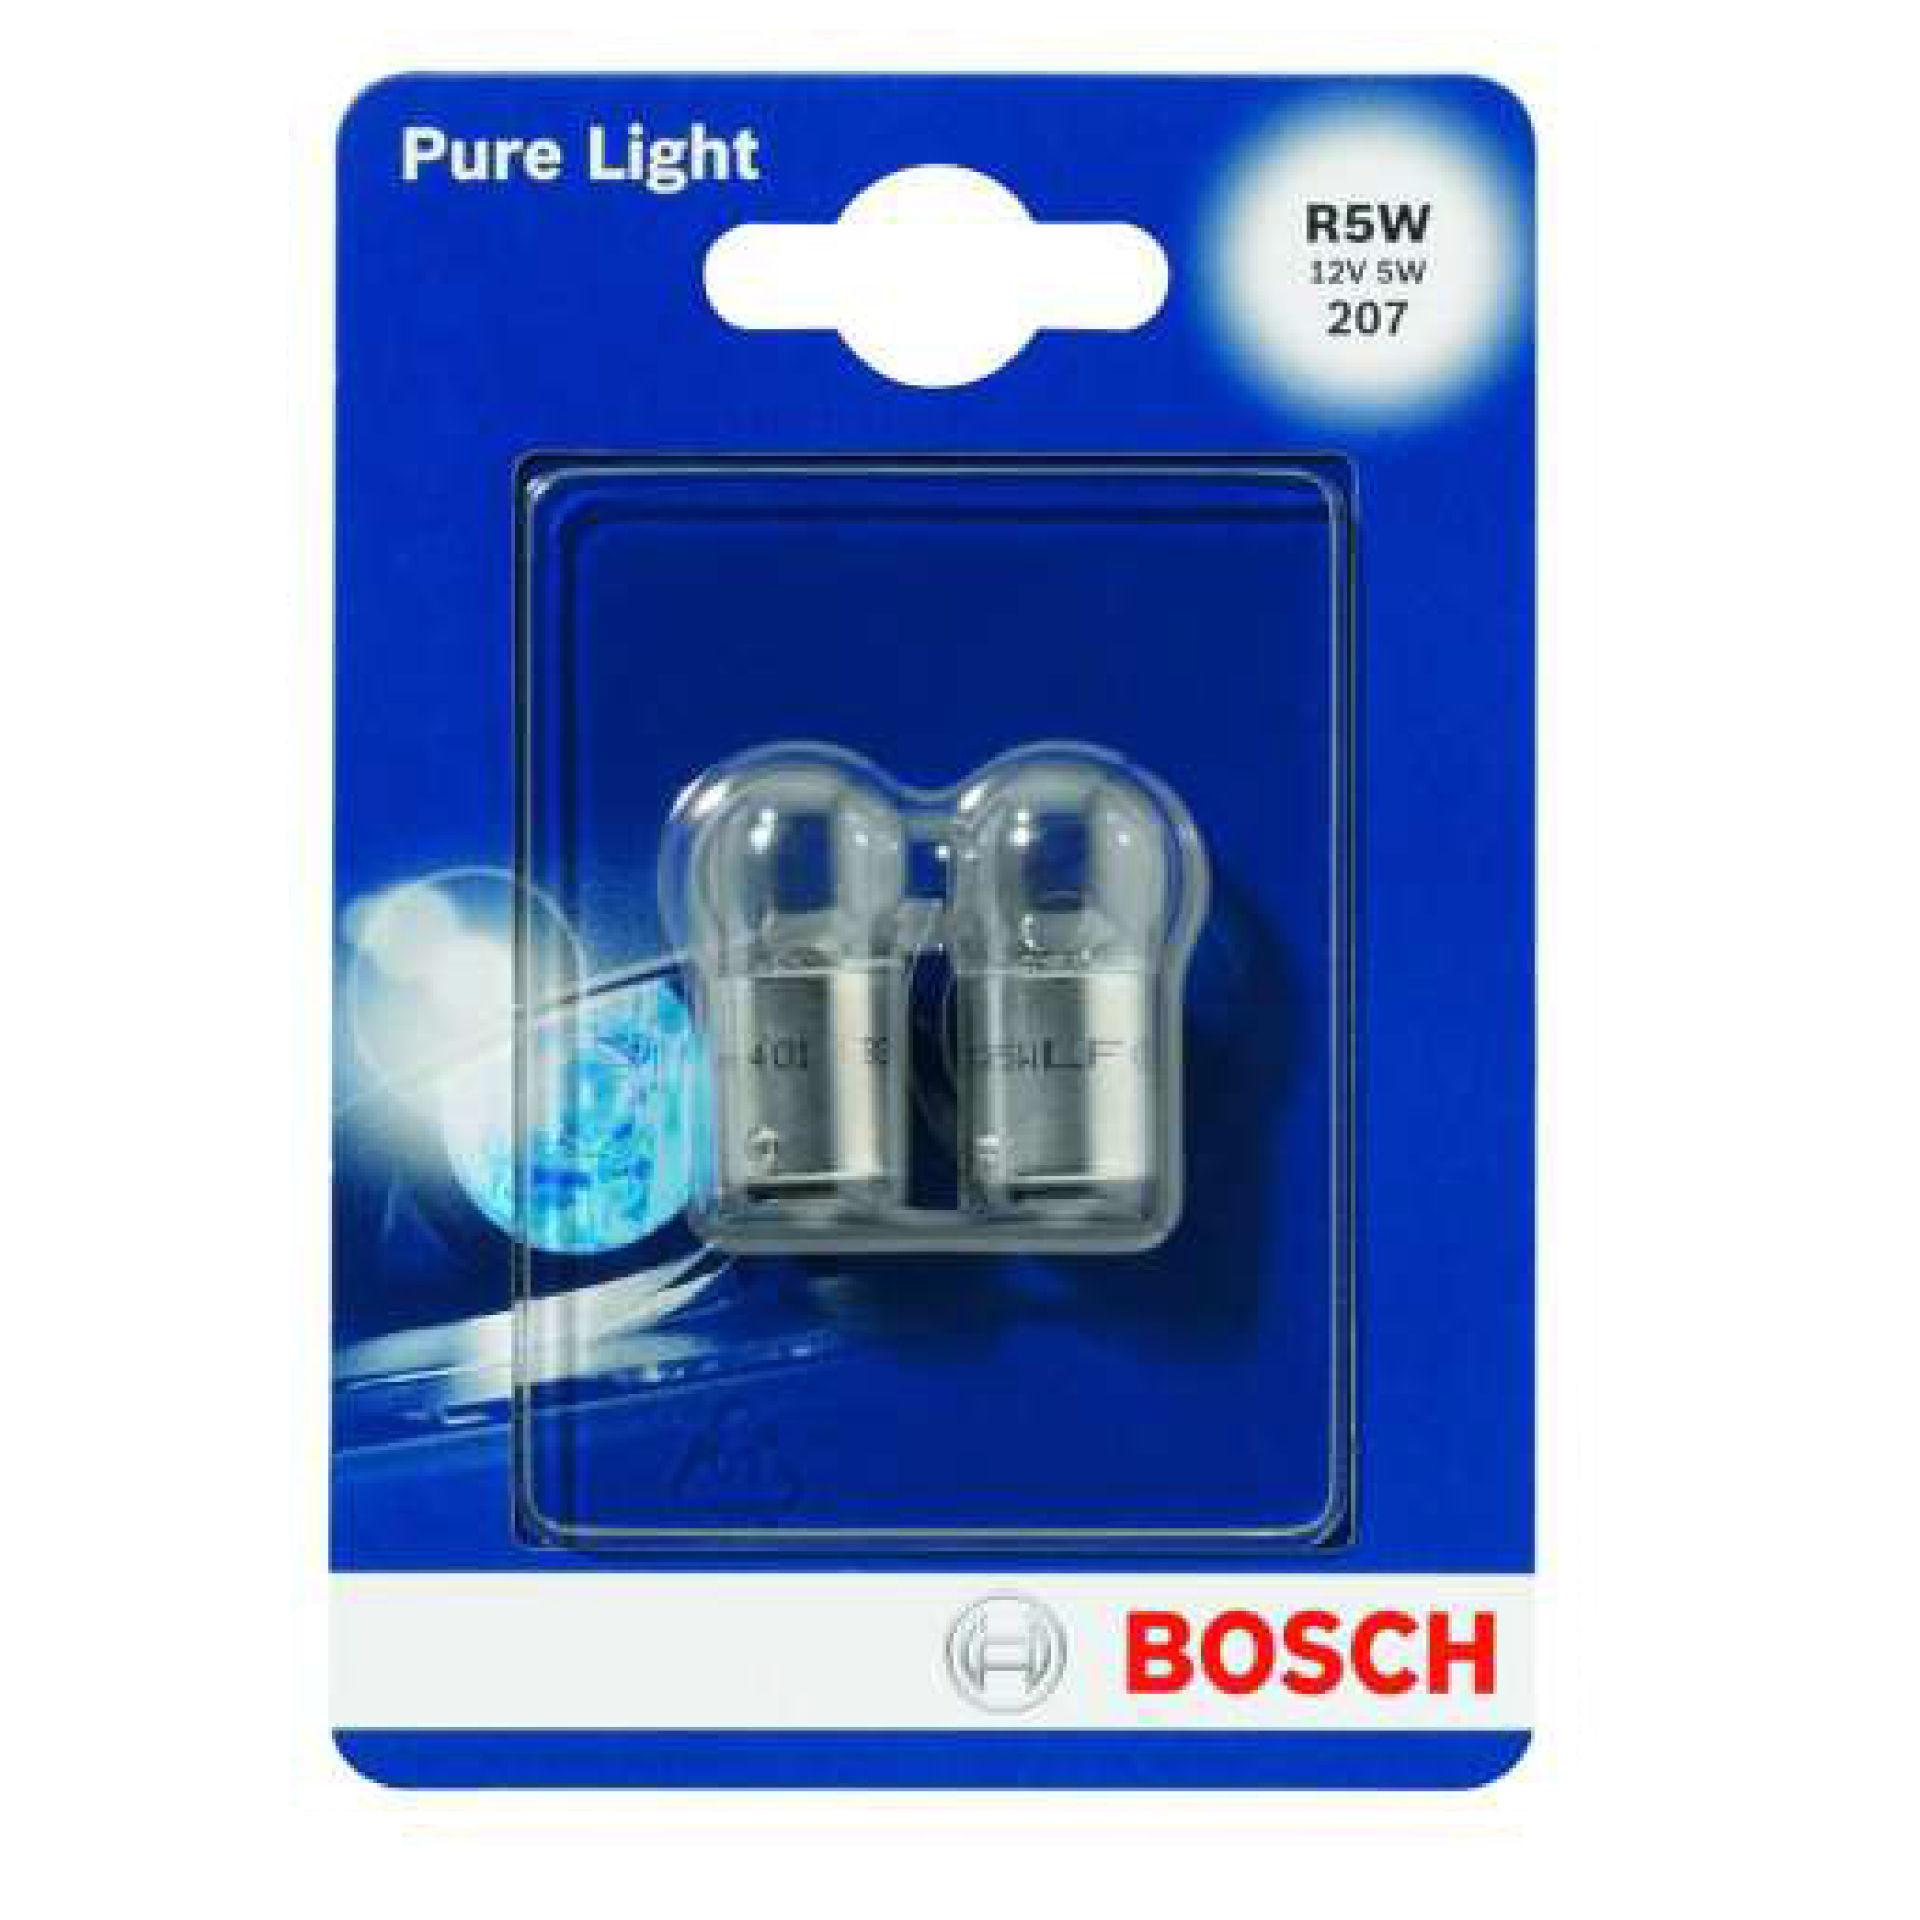 BOSCH 2 LAMP R5W 022Bosch